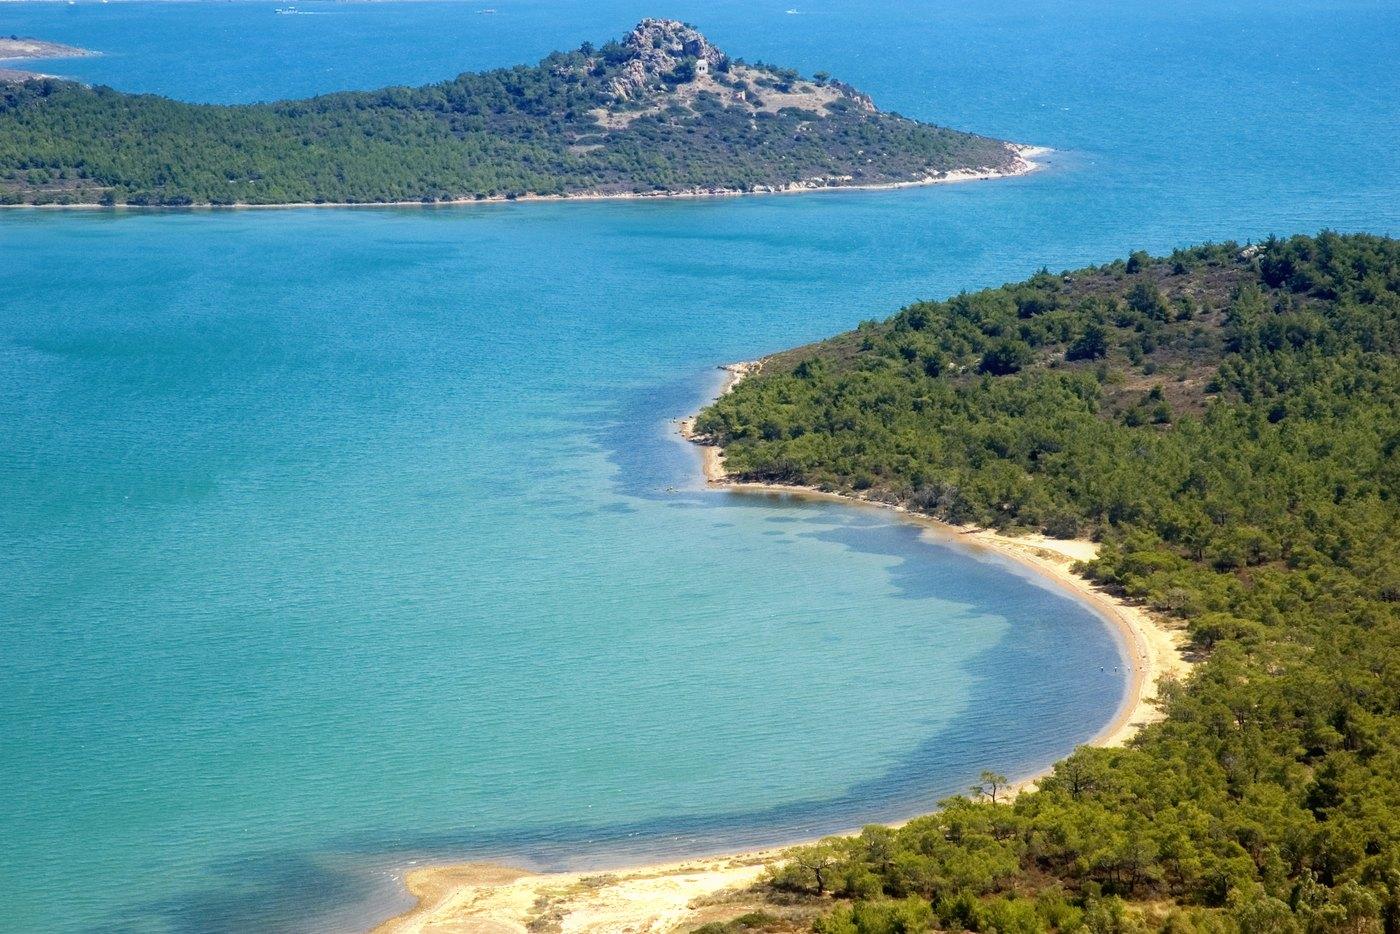 Photo Tour of Aegean Islands 5